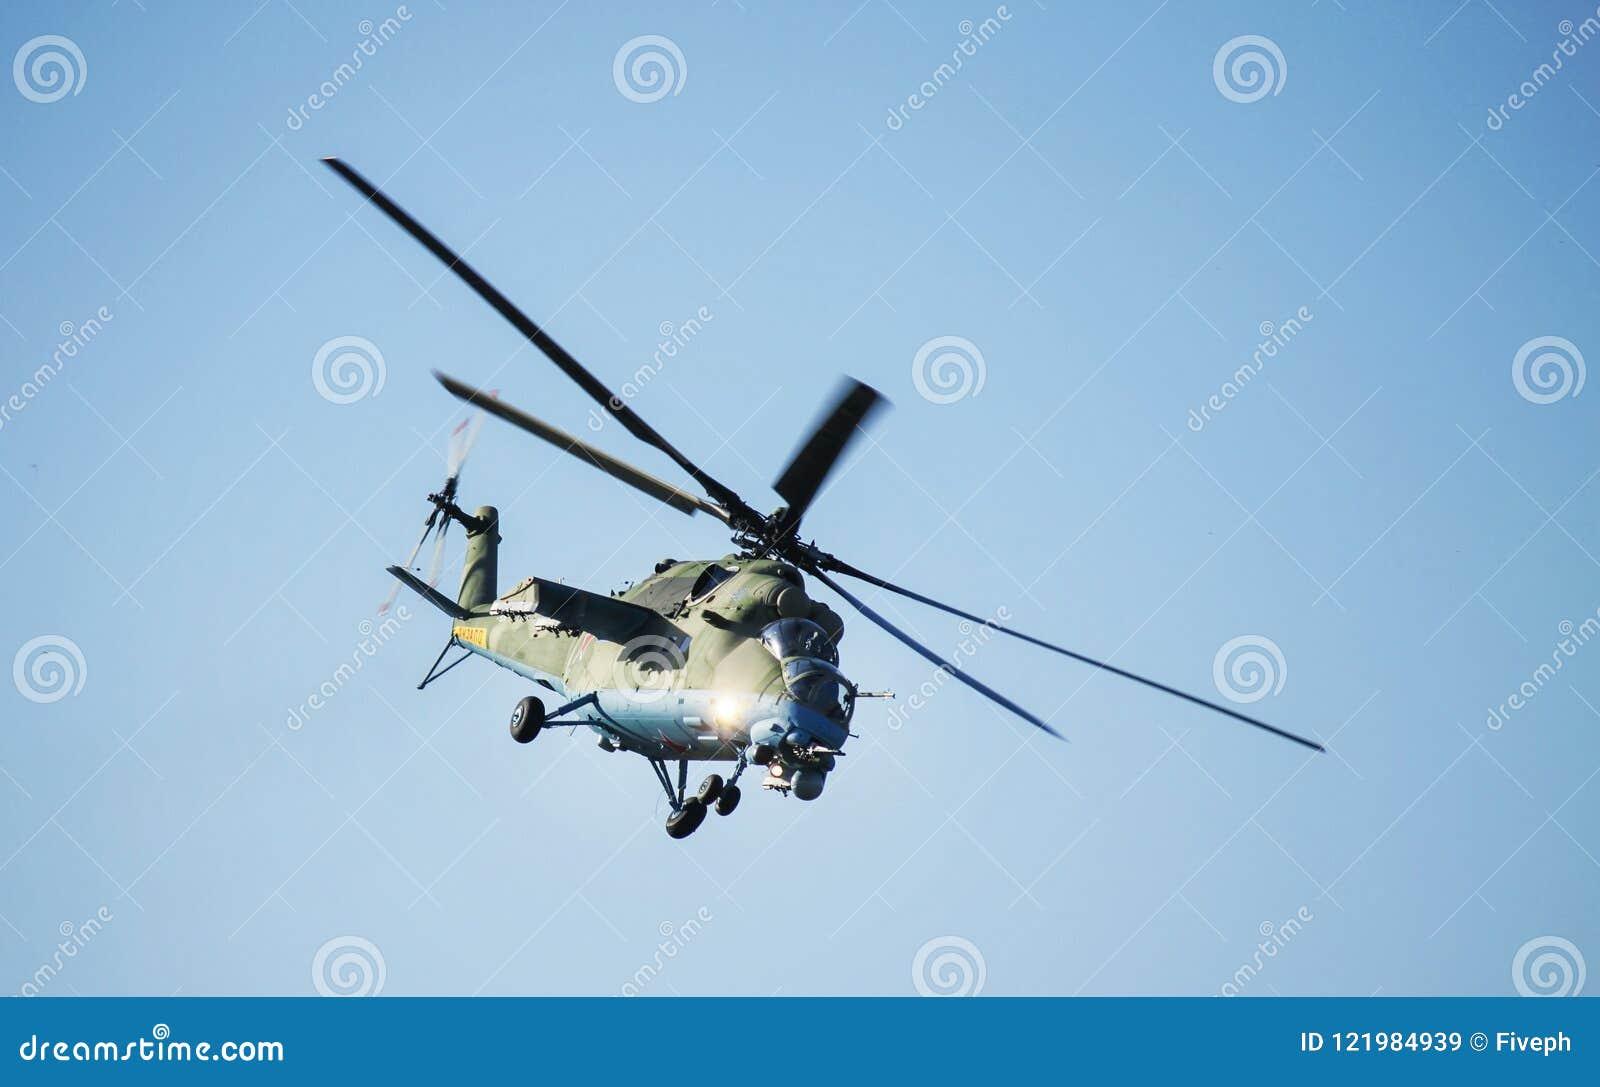 Rostov-On-Don, Rússia - 1º de julho de 2014: Helicóptero de combate do russo